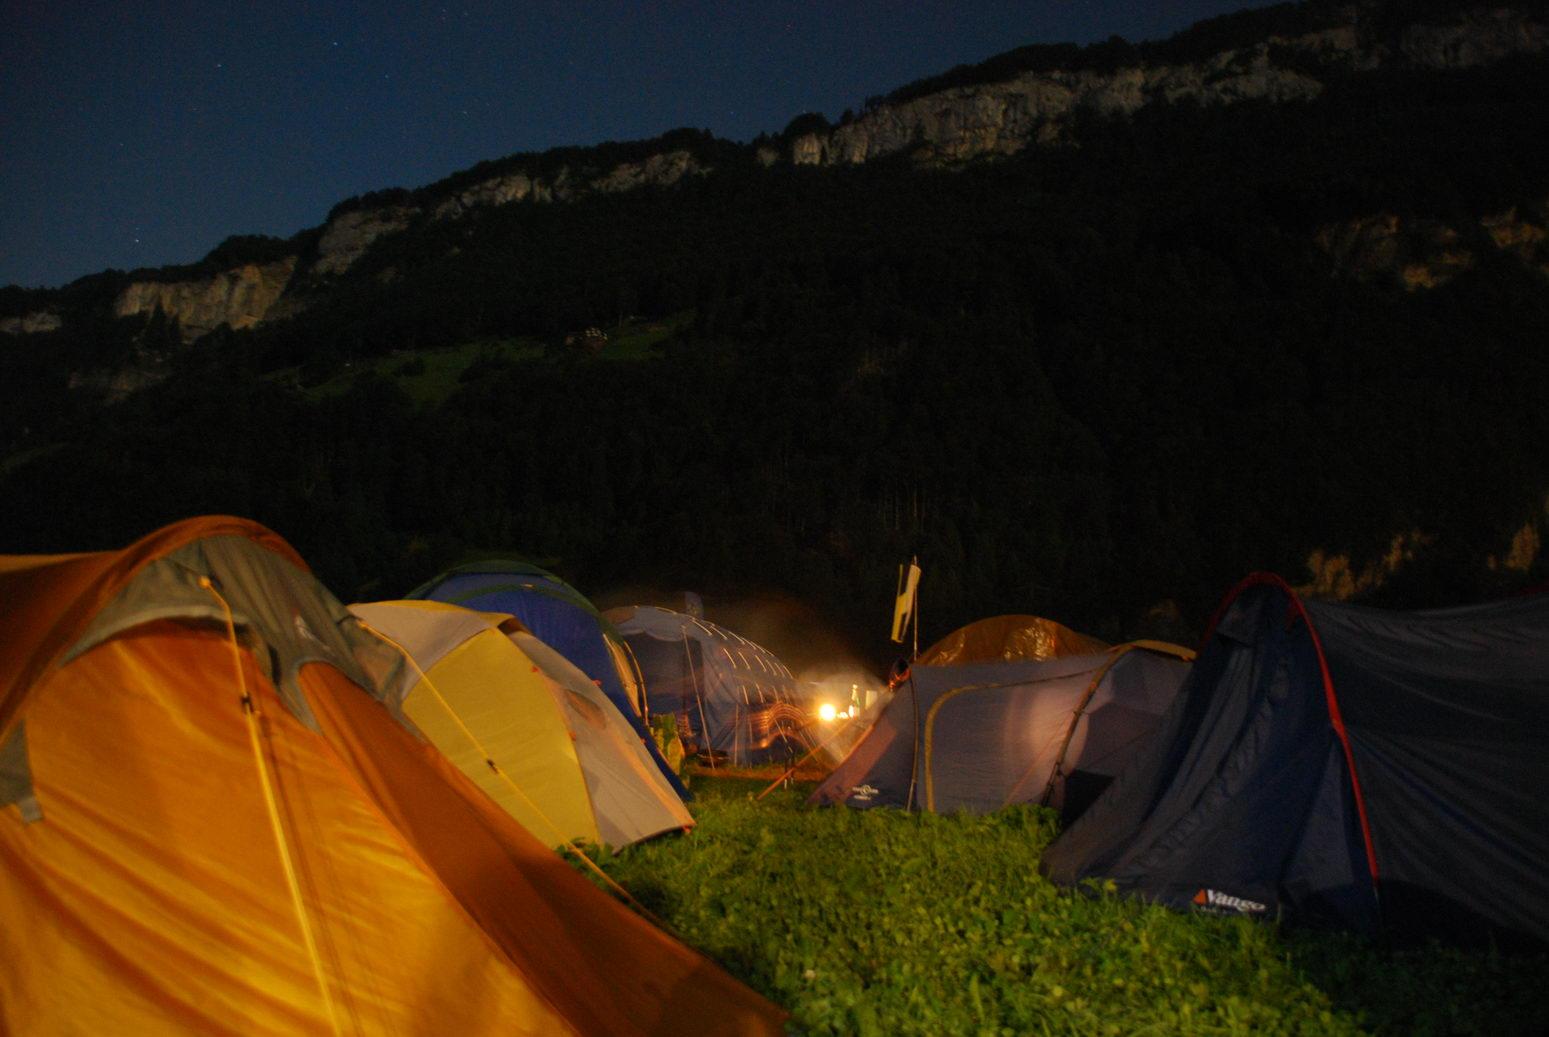 camp-by-night-2-swiss-o-week-switzerland